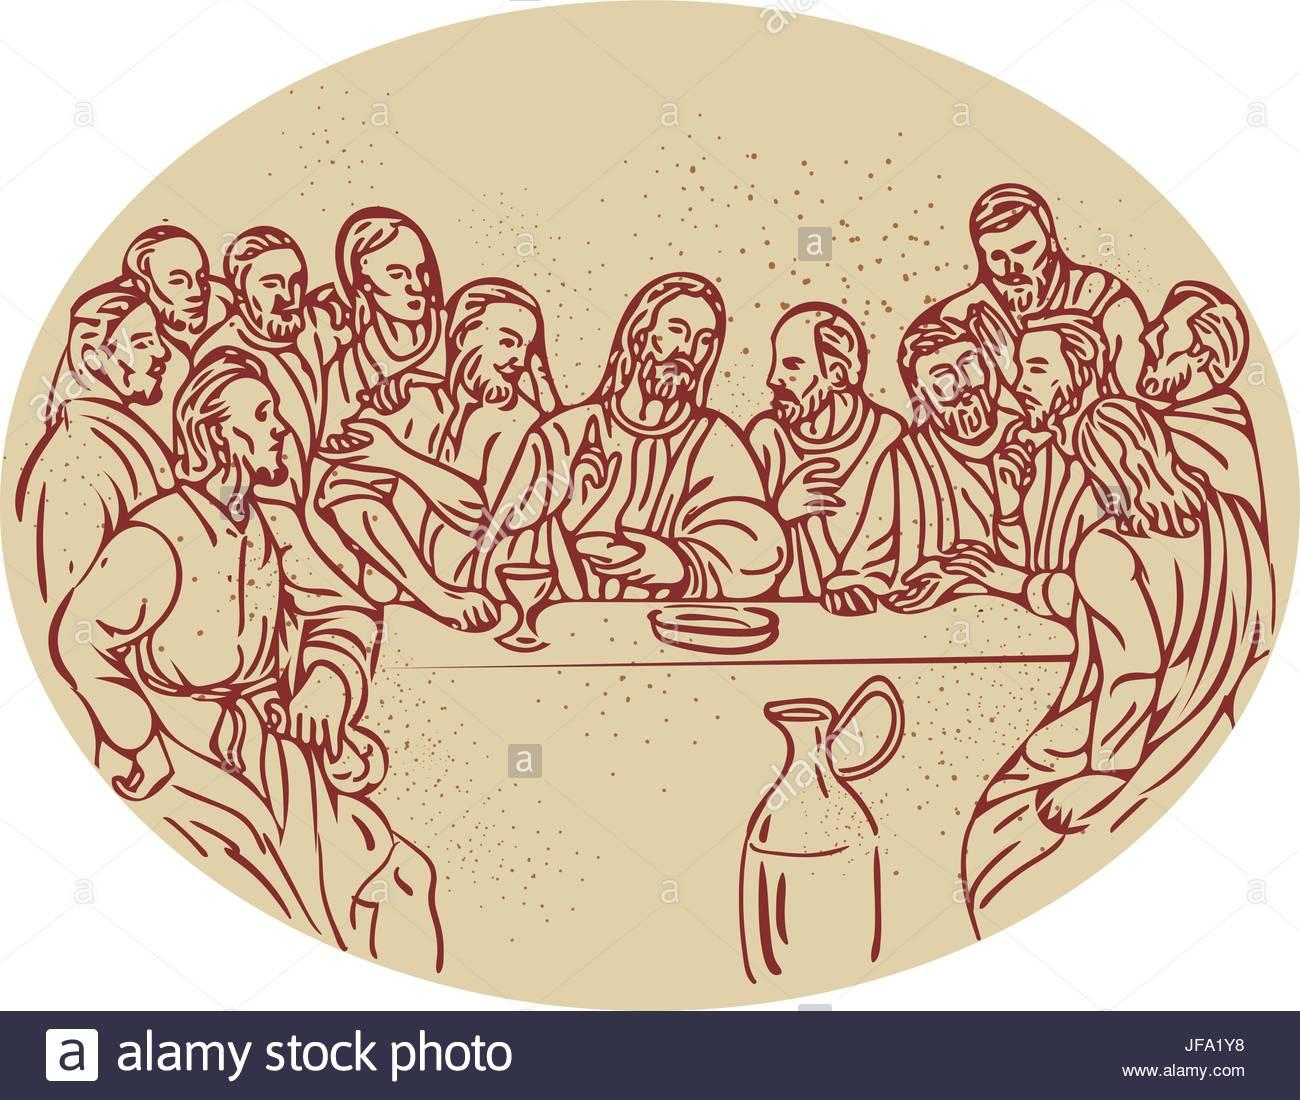 1300x1100 Last Supper Jesus Apostles Drawing Stock Vector Art Amp Illustration